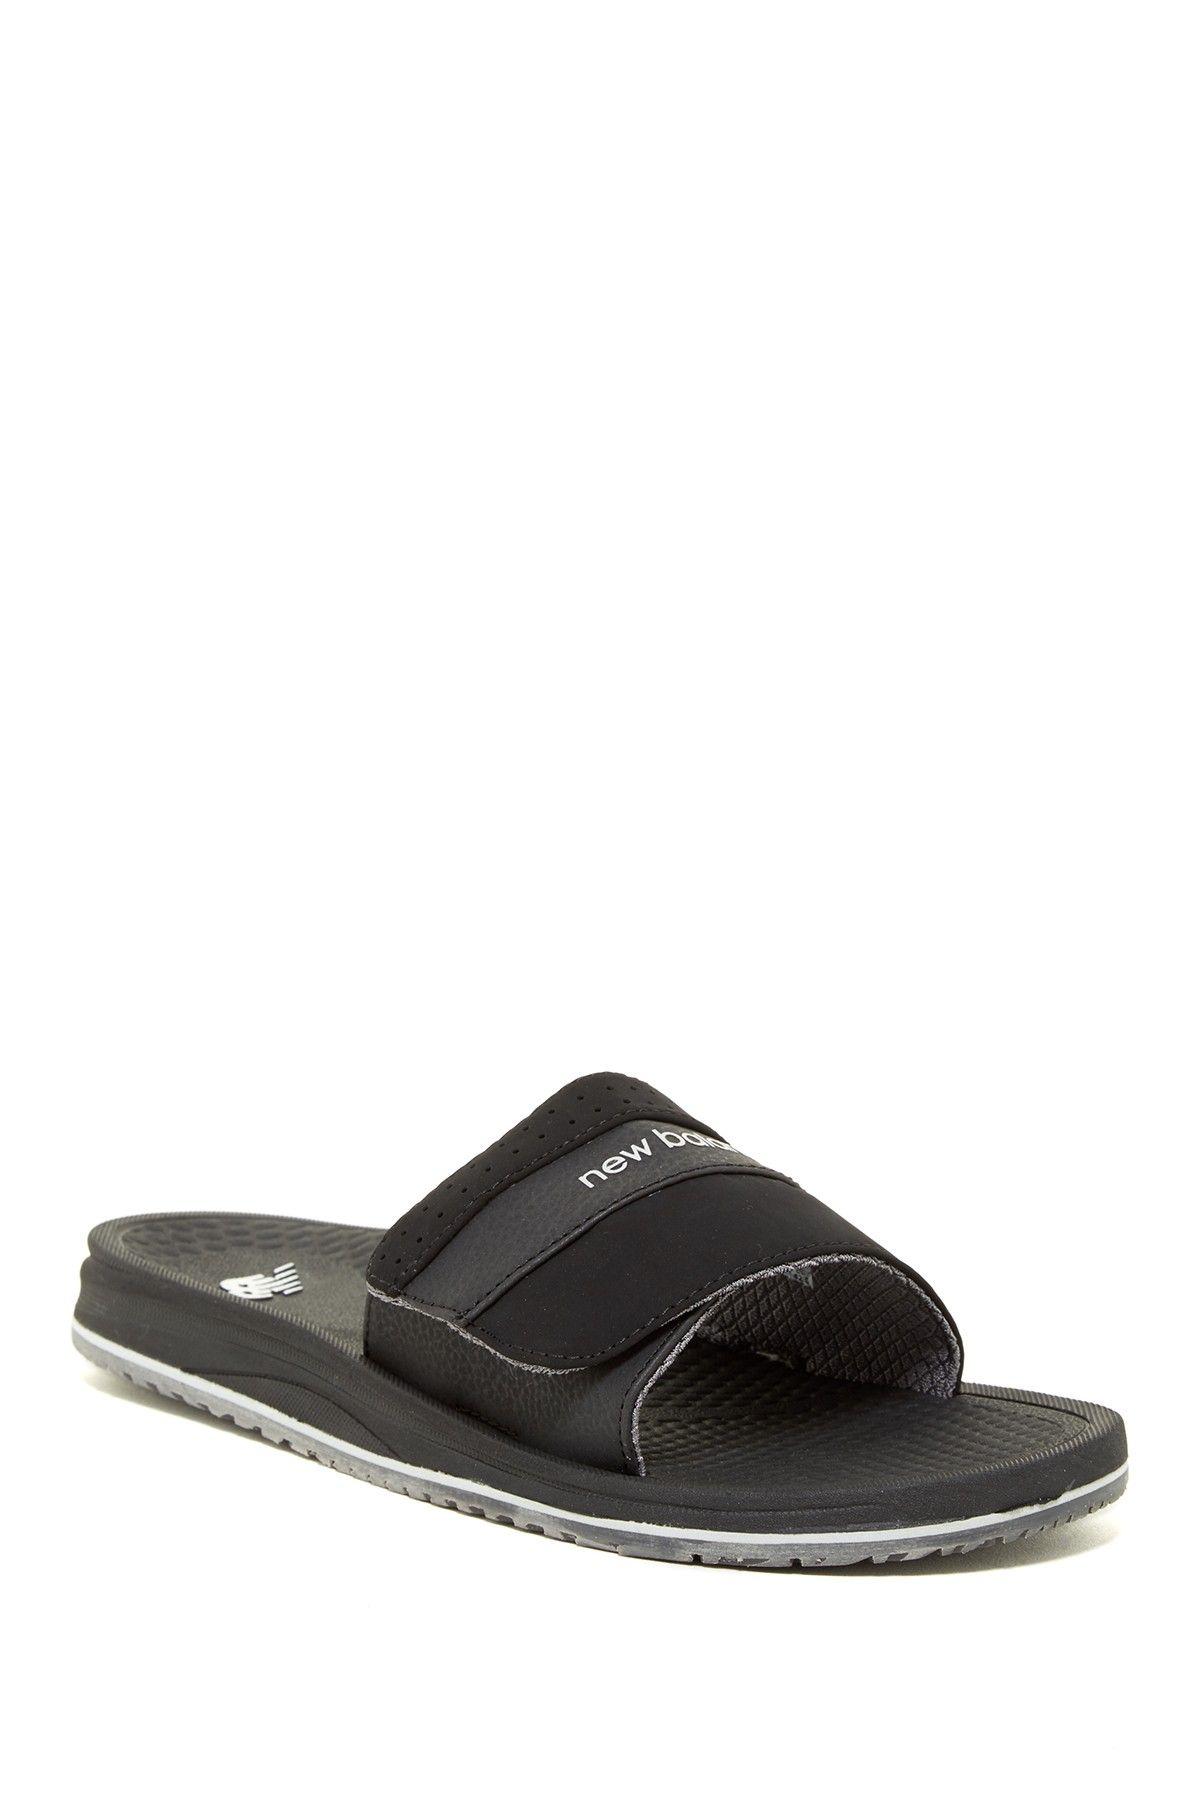 Purealign Slide Sandal - Wide Width Available